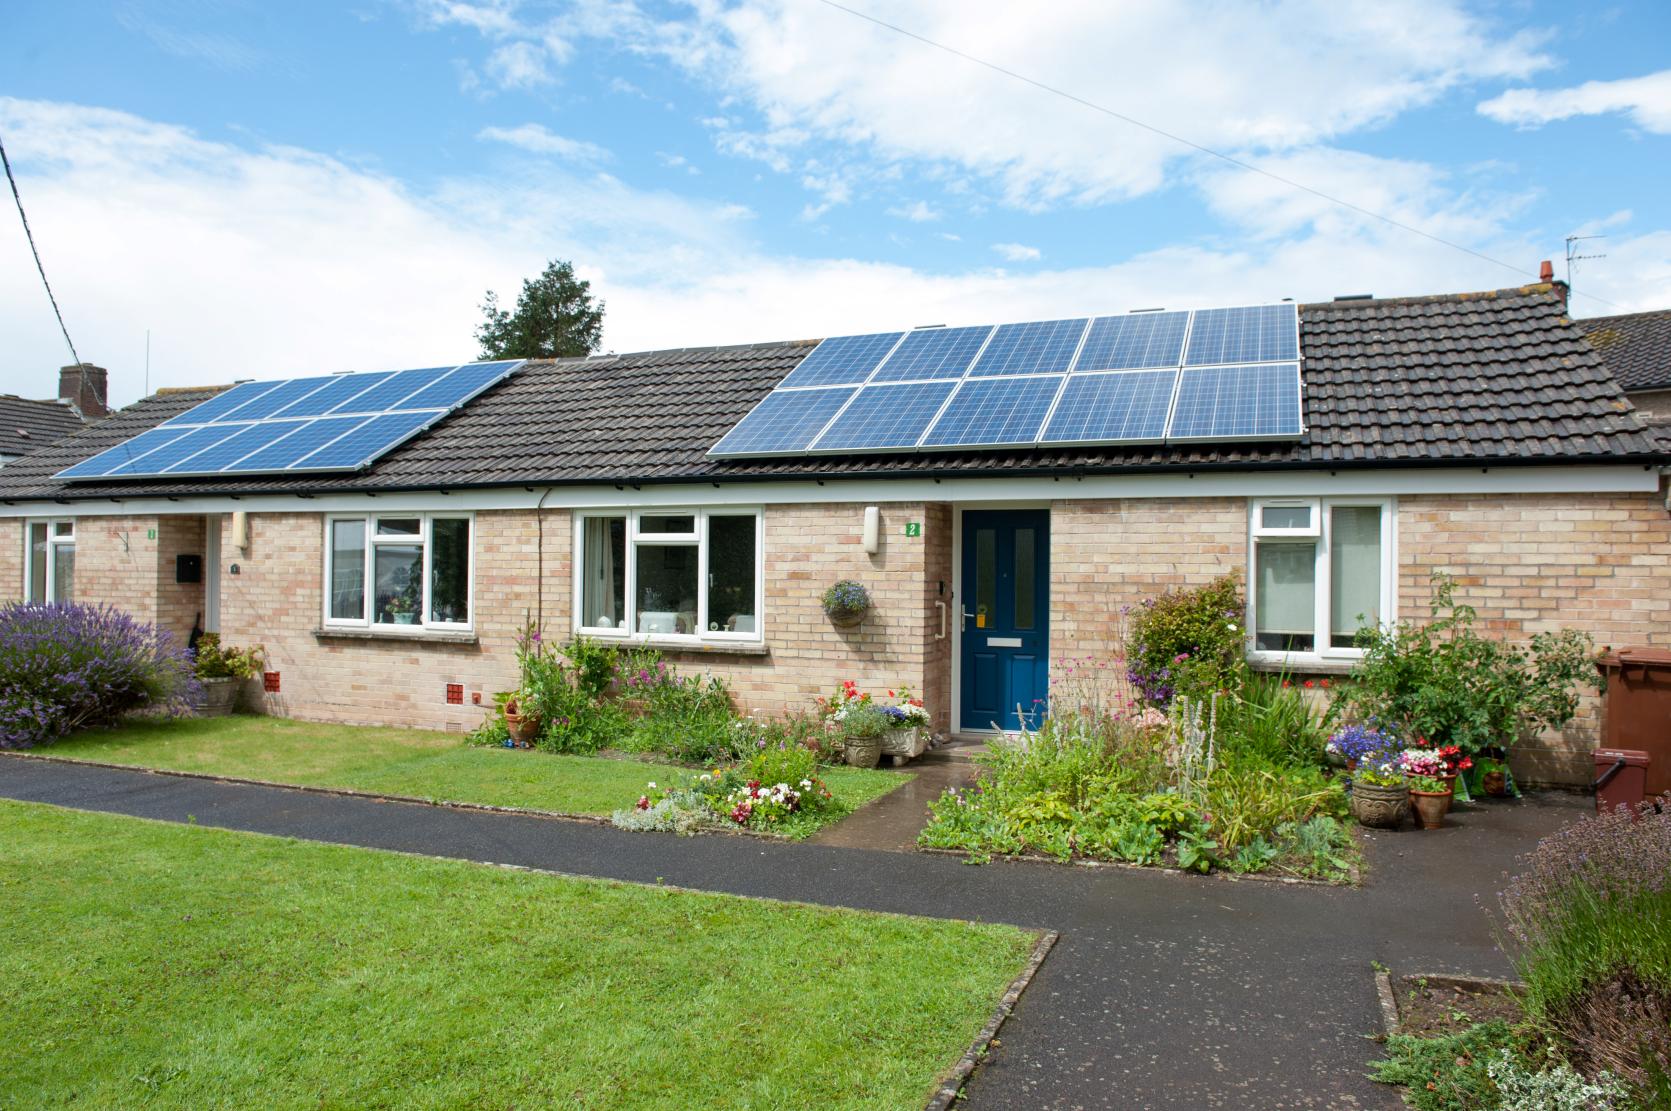 Solar PV Repairs & Maintenance - Aster Property